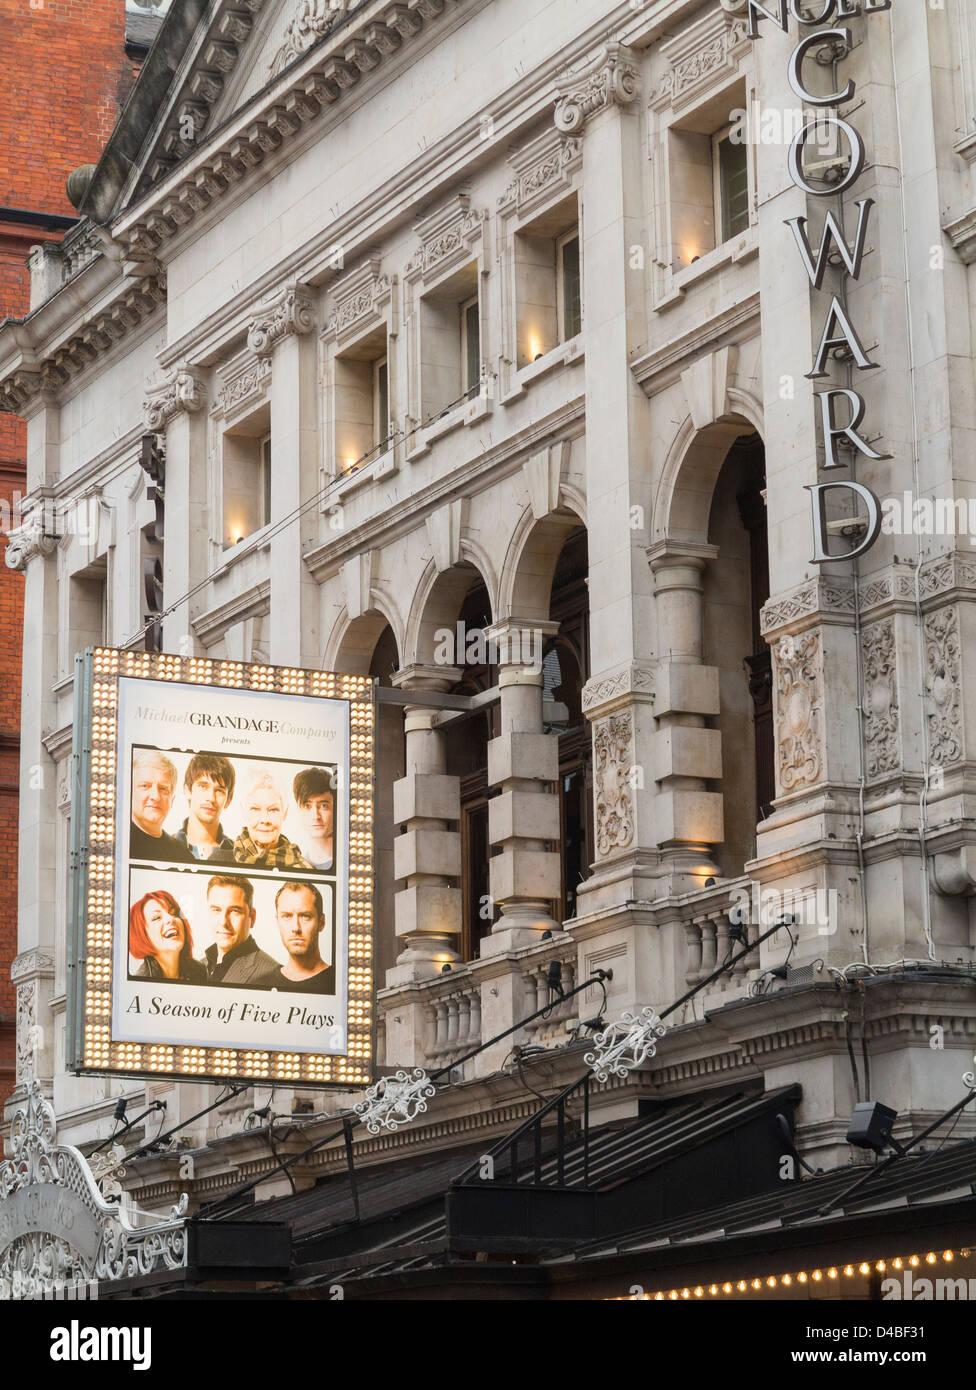 Noel Coward Theatre à St Martin's Lane, London, England Photo Stock